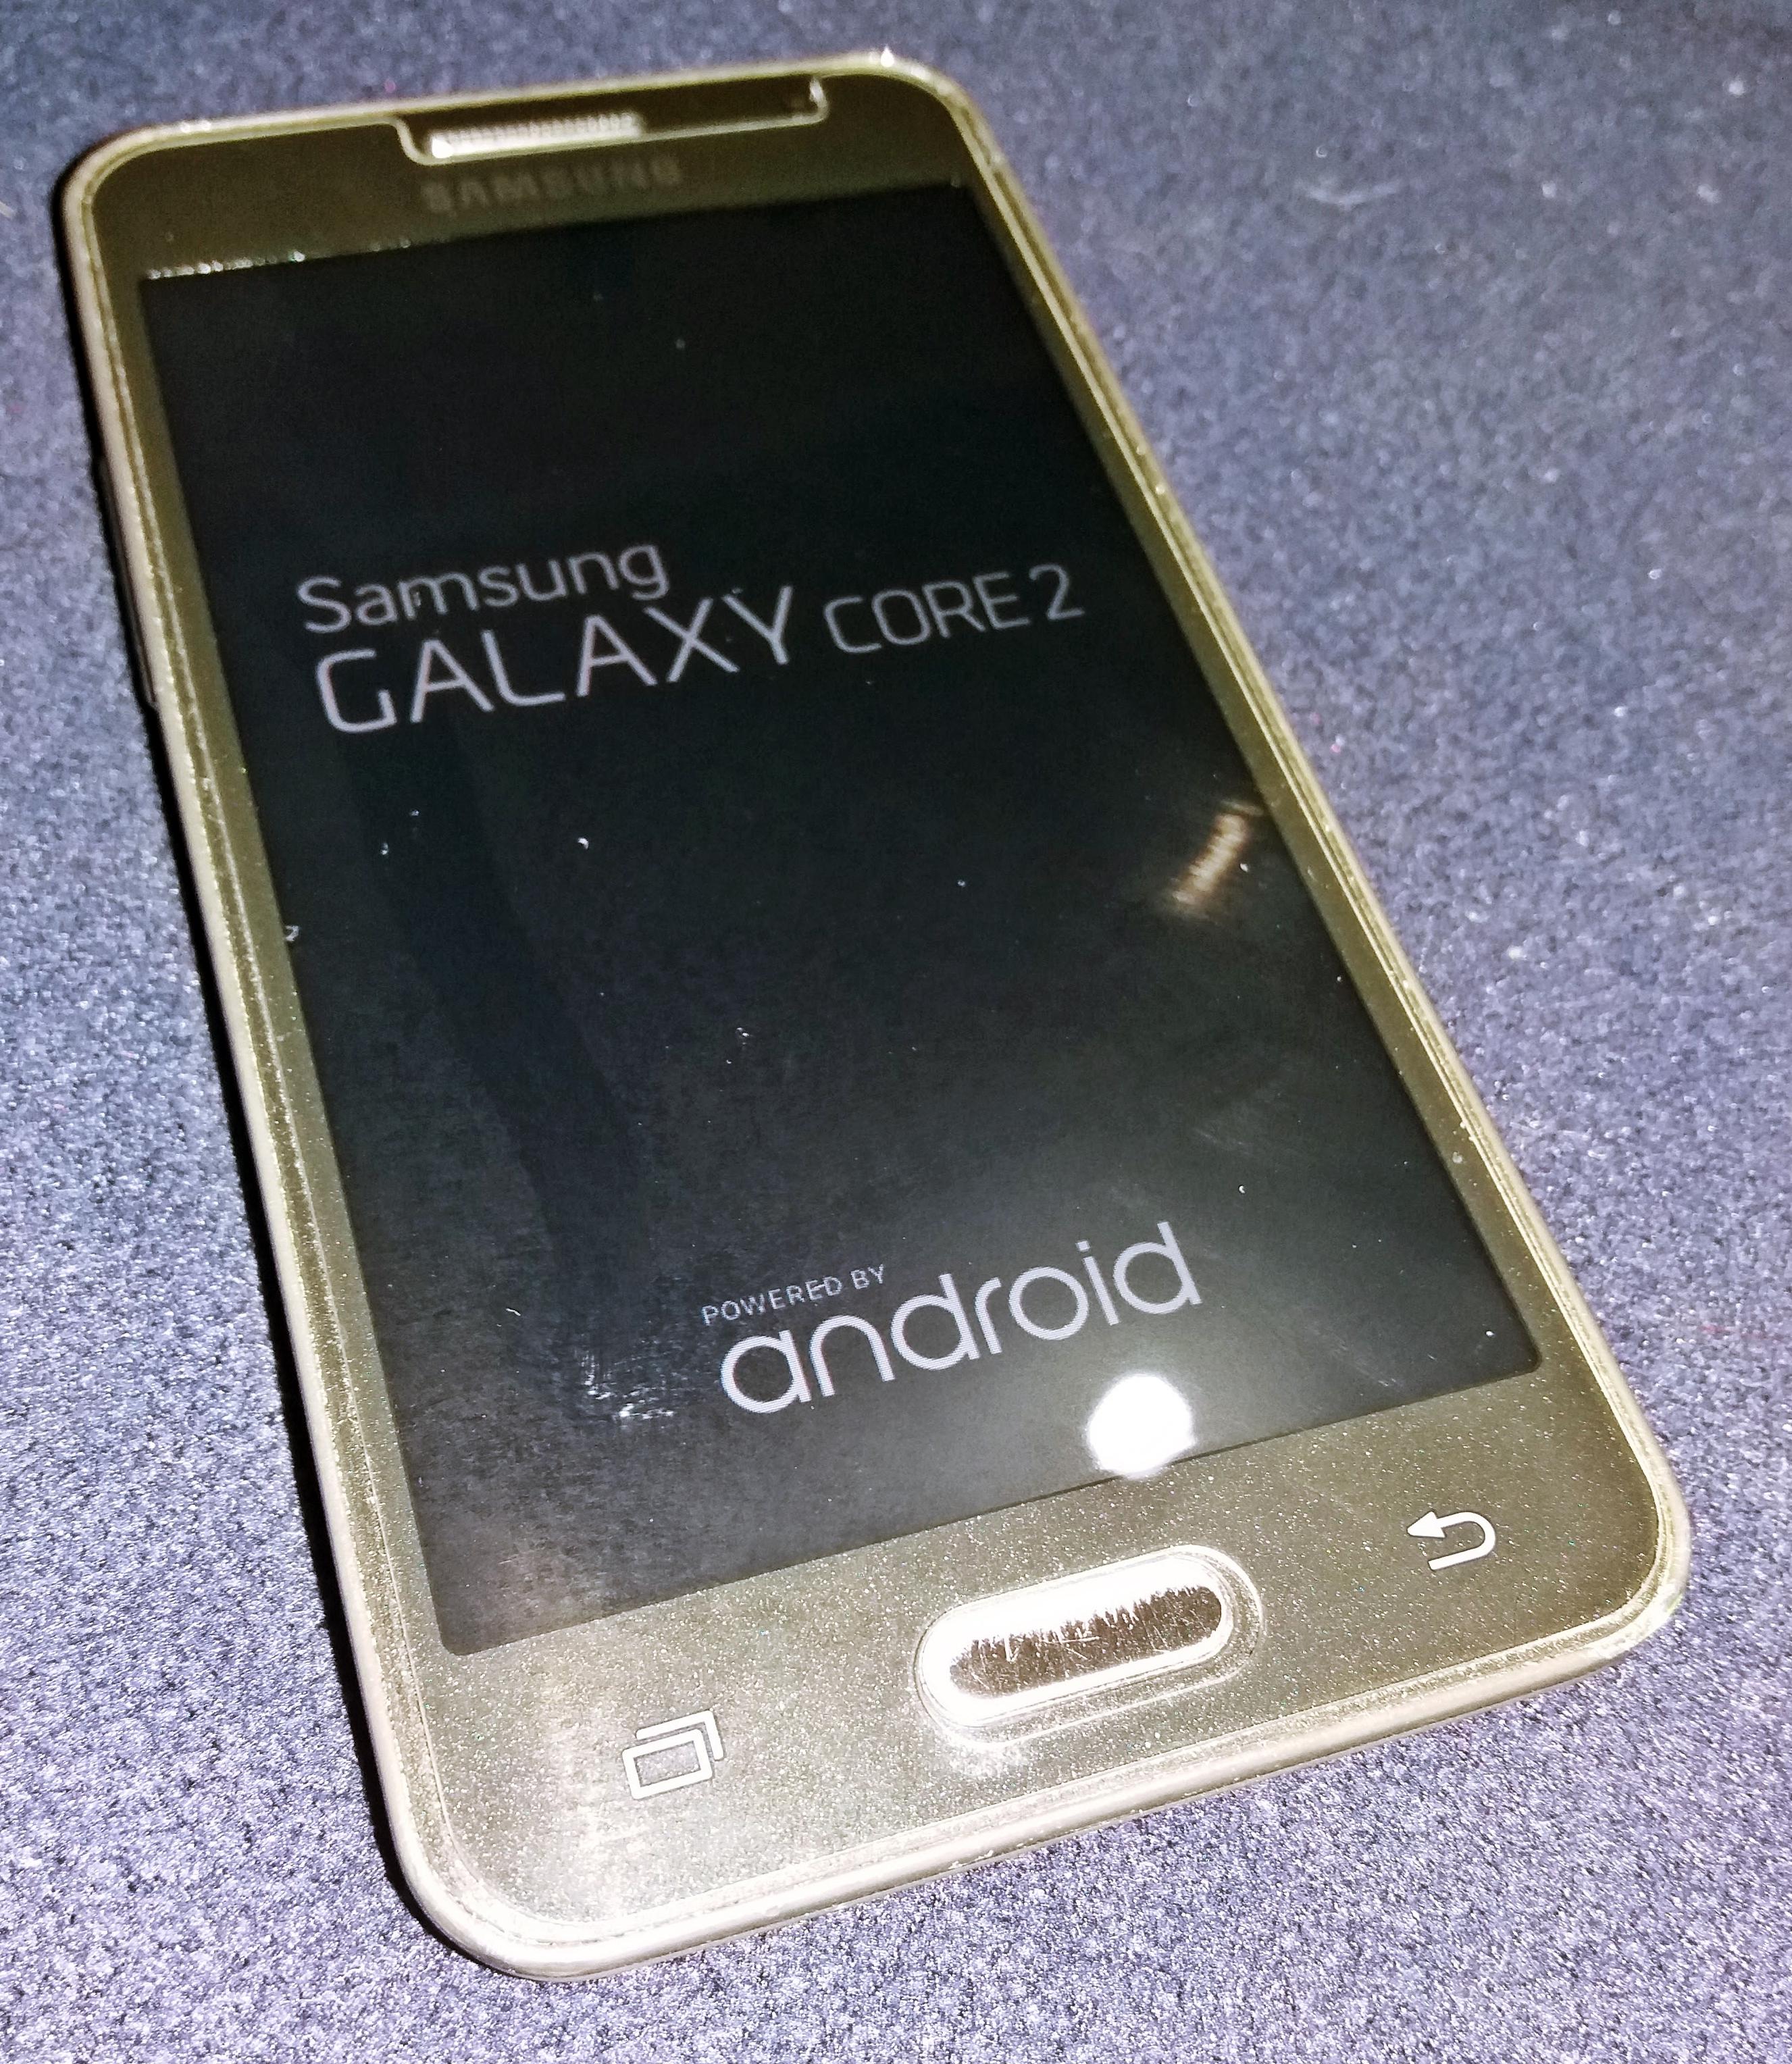 Samsung Galaxy Core 2 - Wikipedia